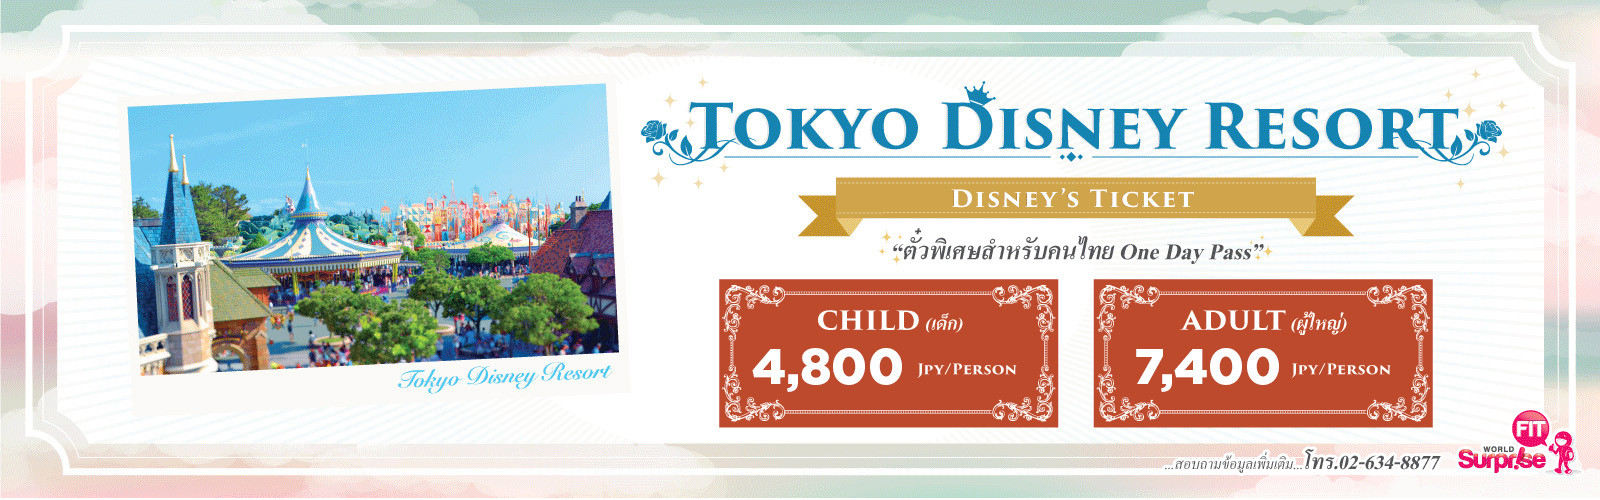 150505-Tokyo-Disney-1600x500-pixles